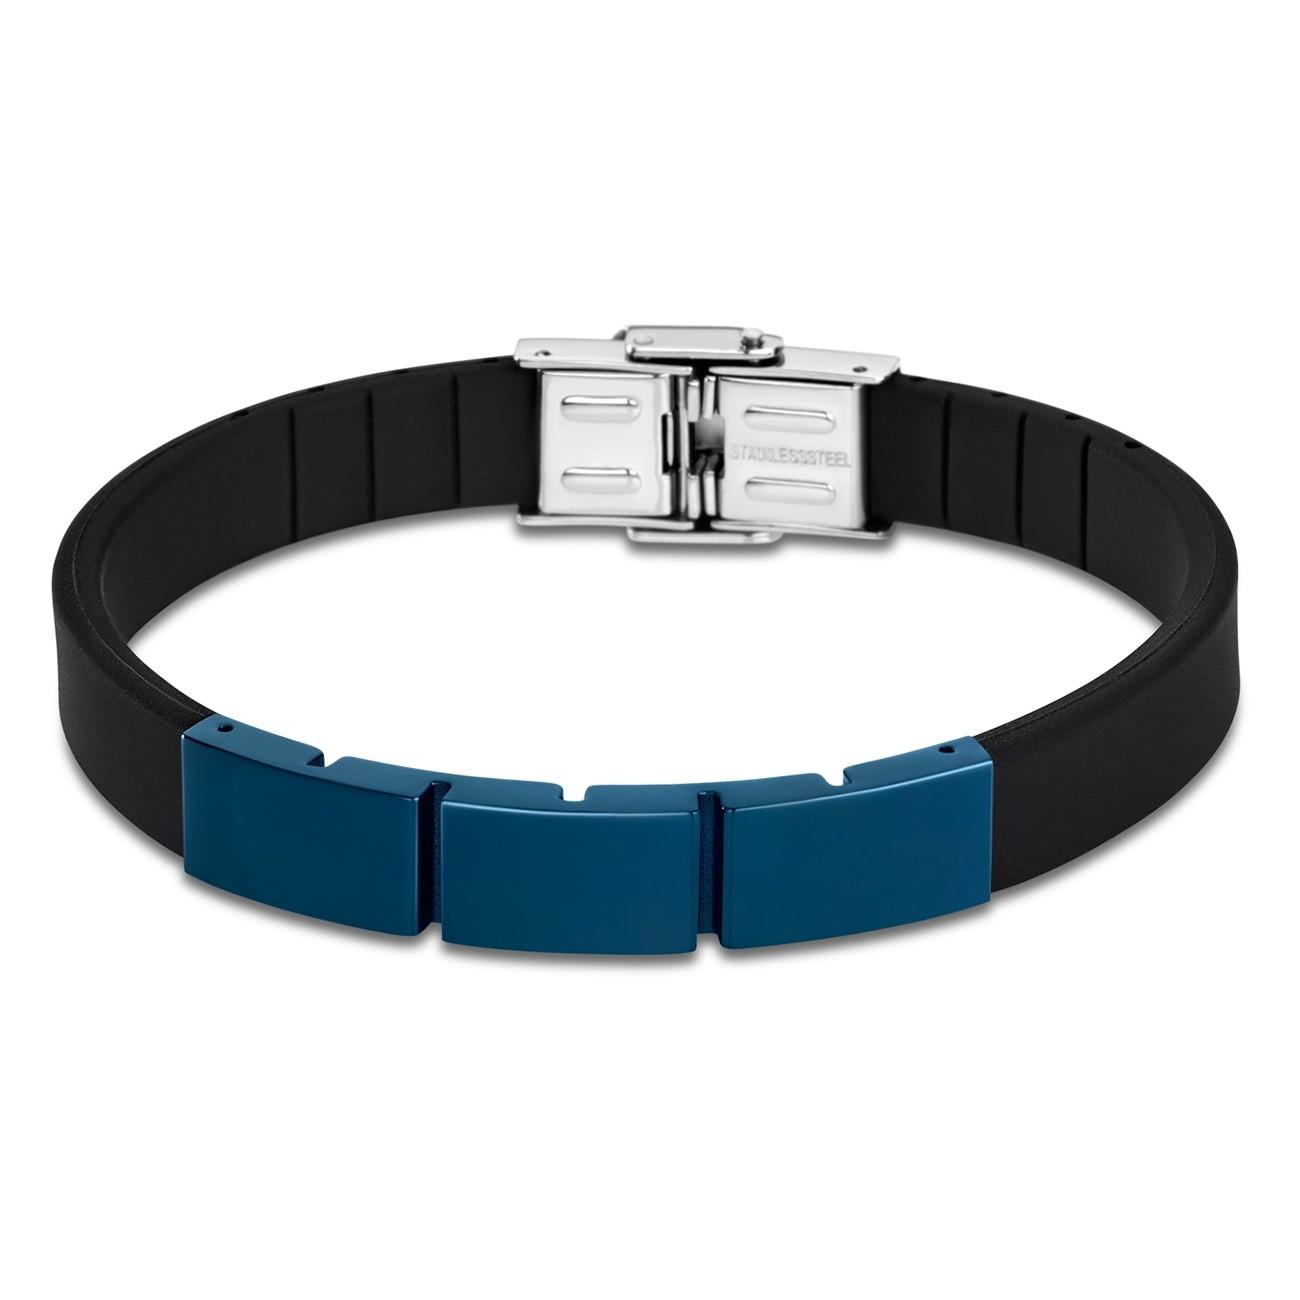 LOTUS Style Armband Herren LS1796-2/2 Edelstahl schwarz blau JLS1796-2-2